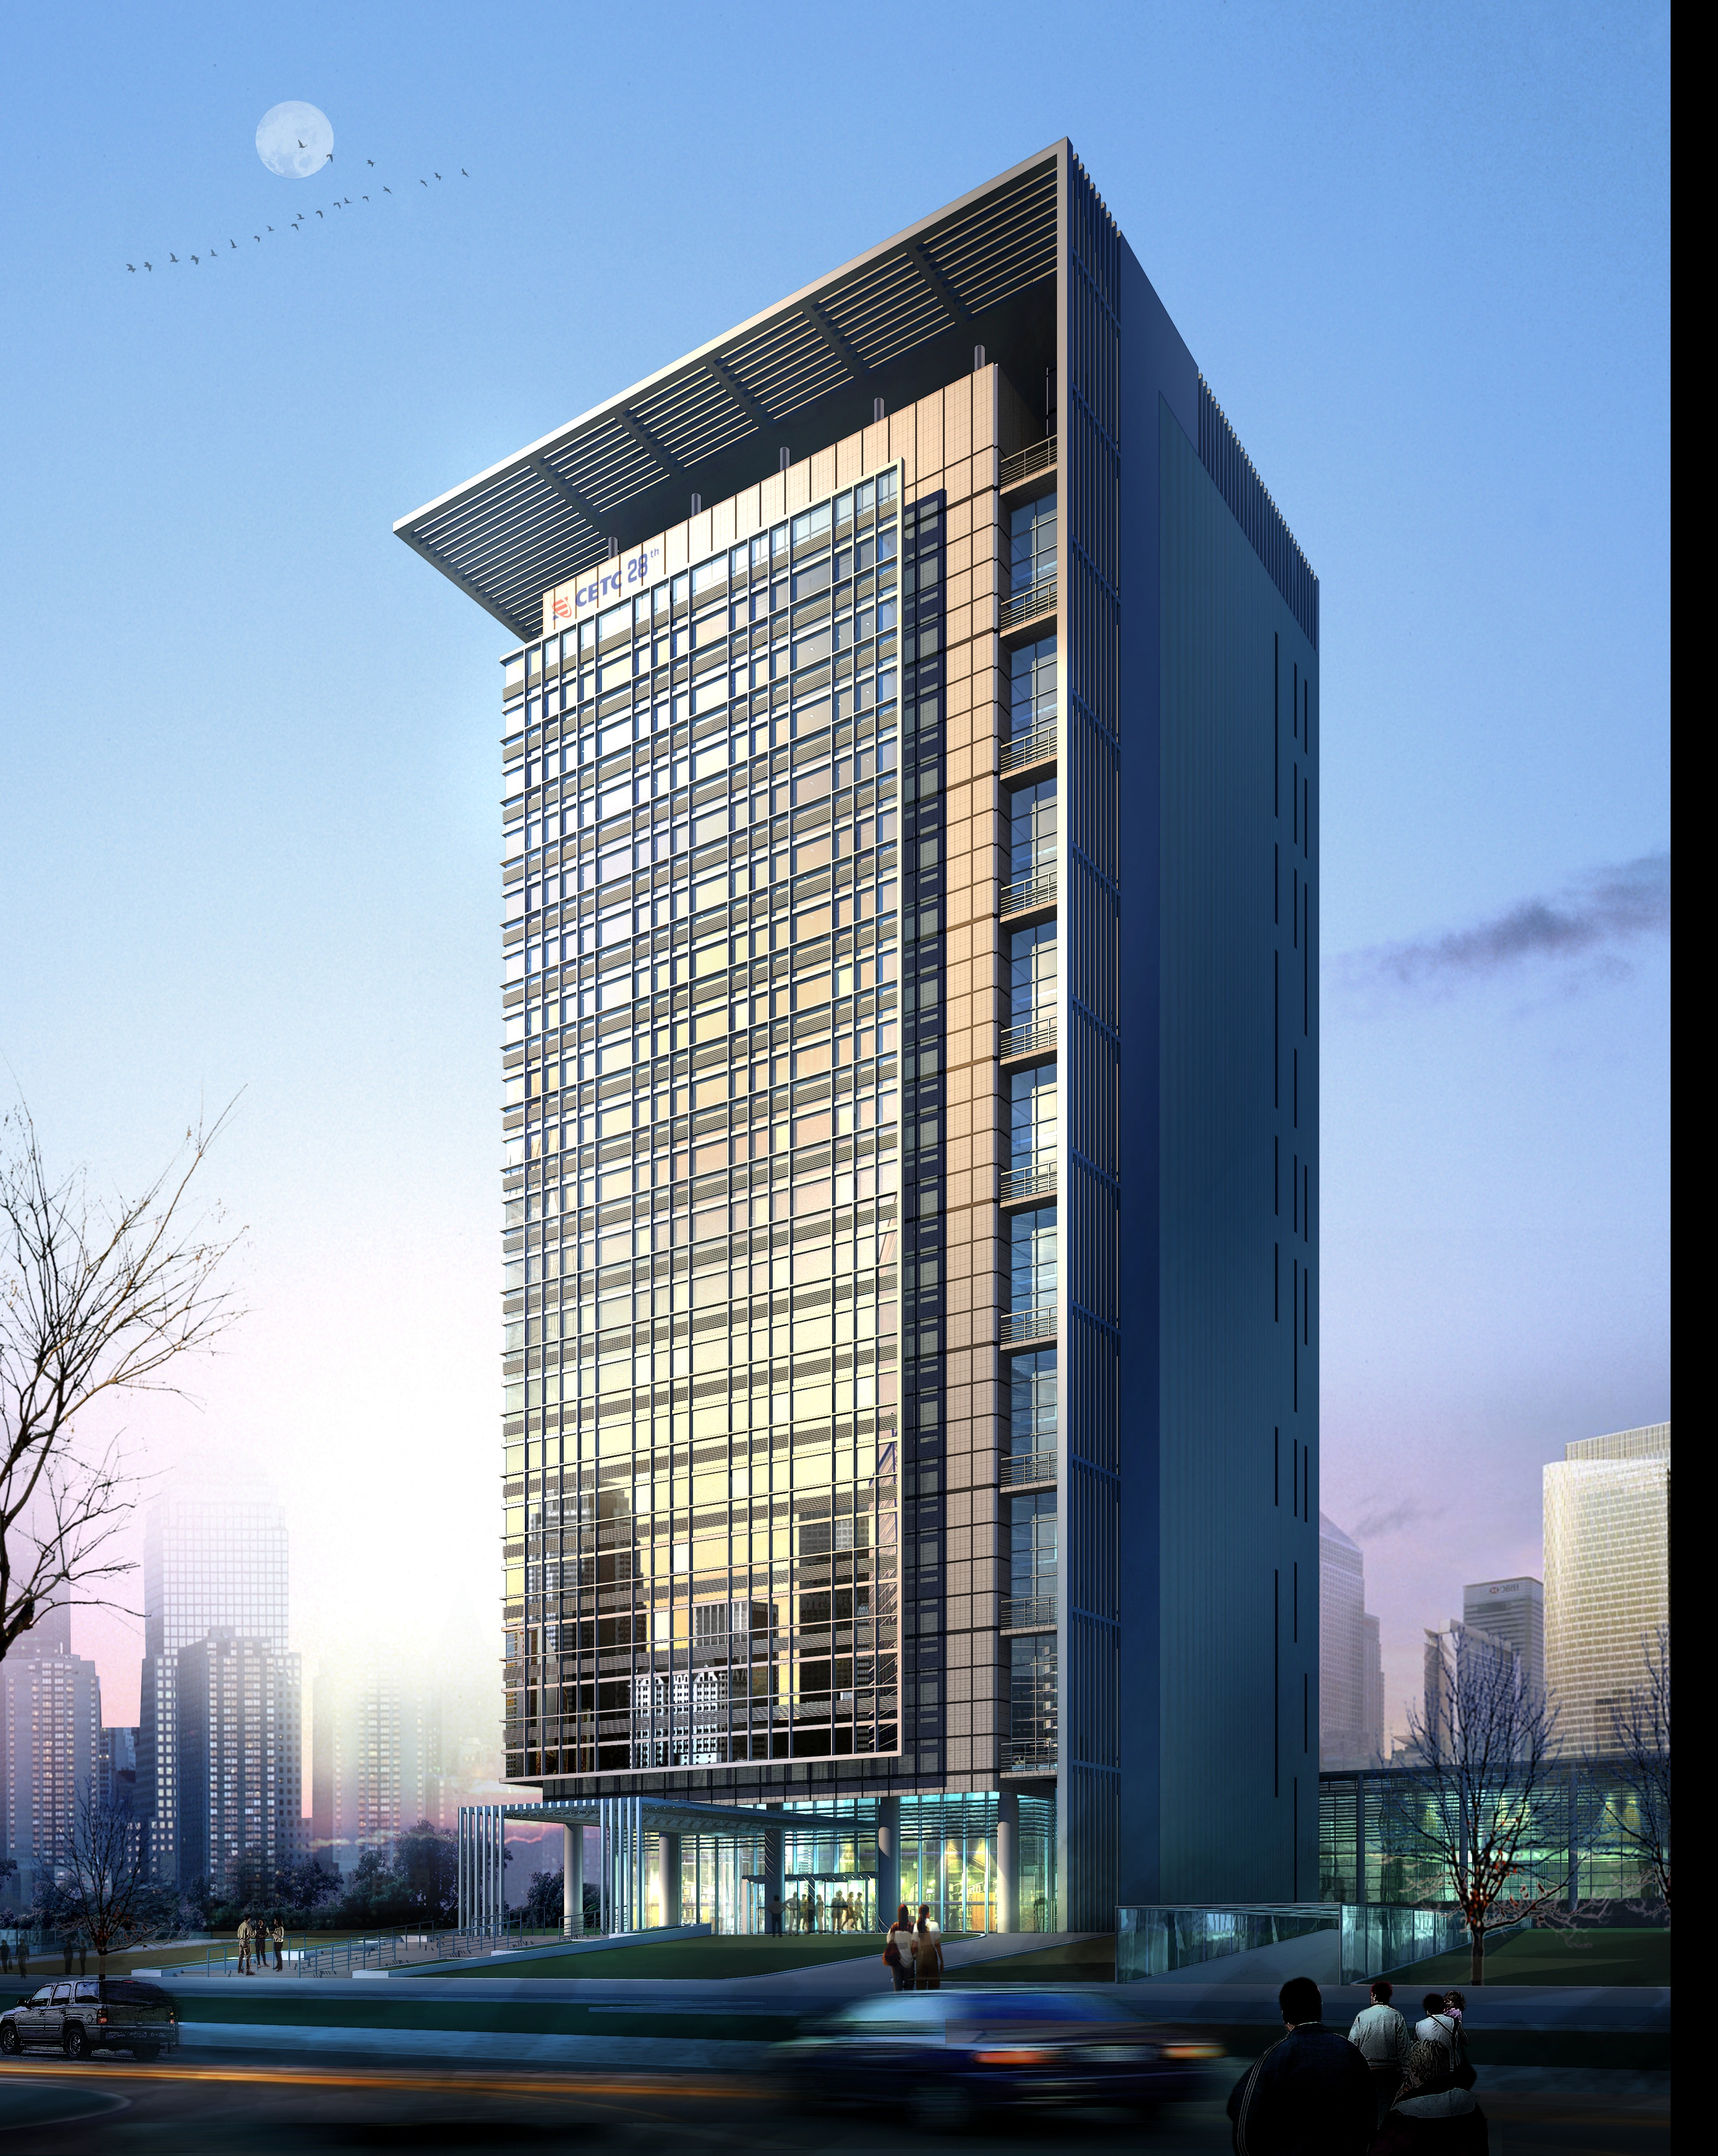 House Design Building Games Modern Skyscraper 3d Model Max Cgtrader Com